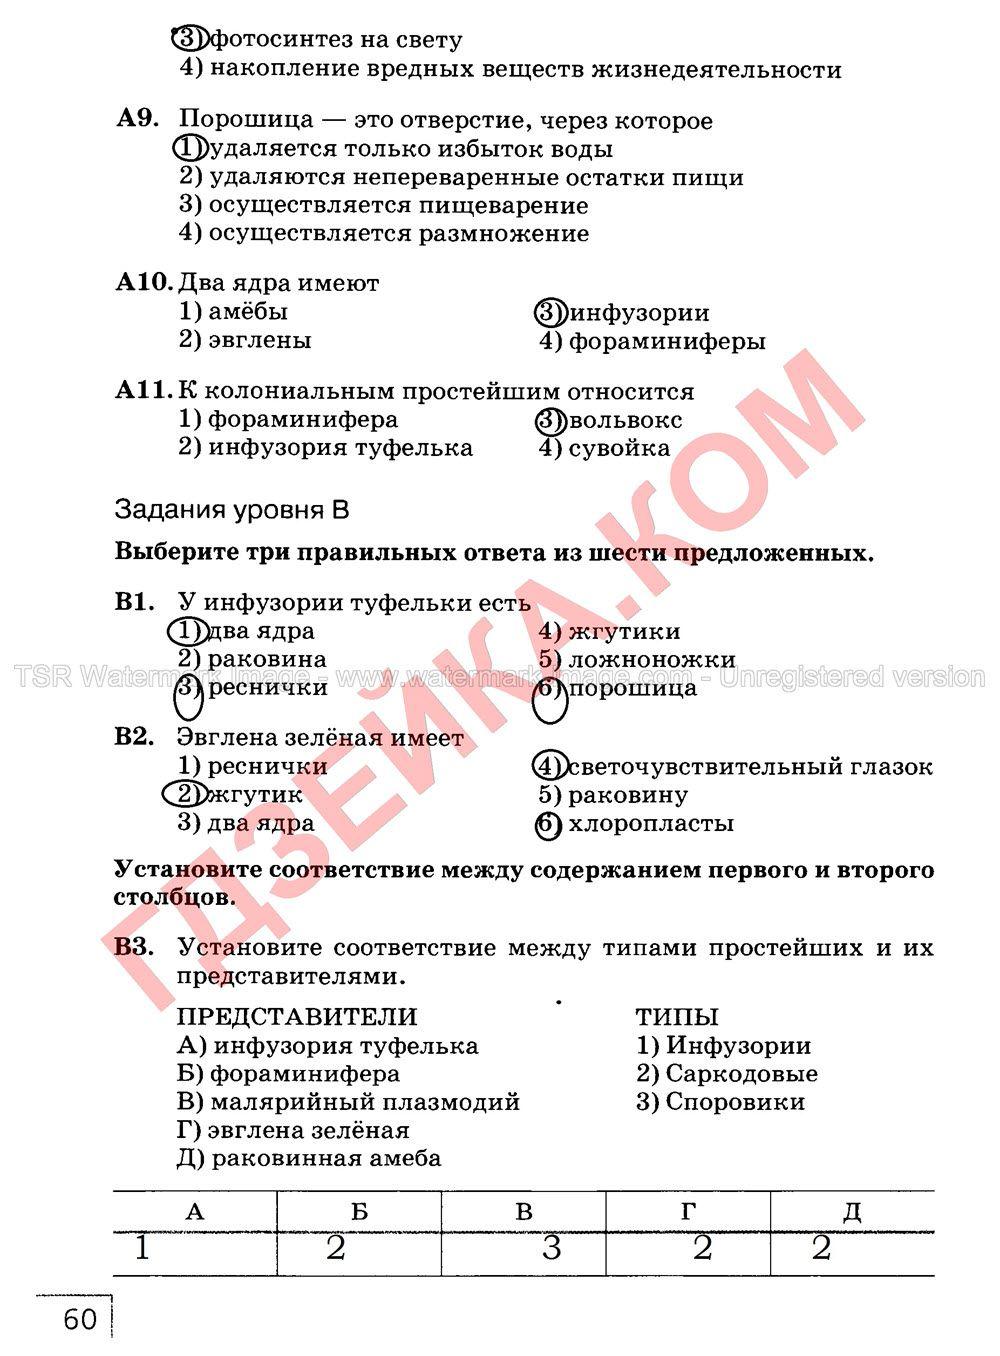 Перевод из англиского на руский на 8 класс the houses of parliament